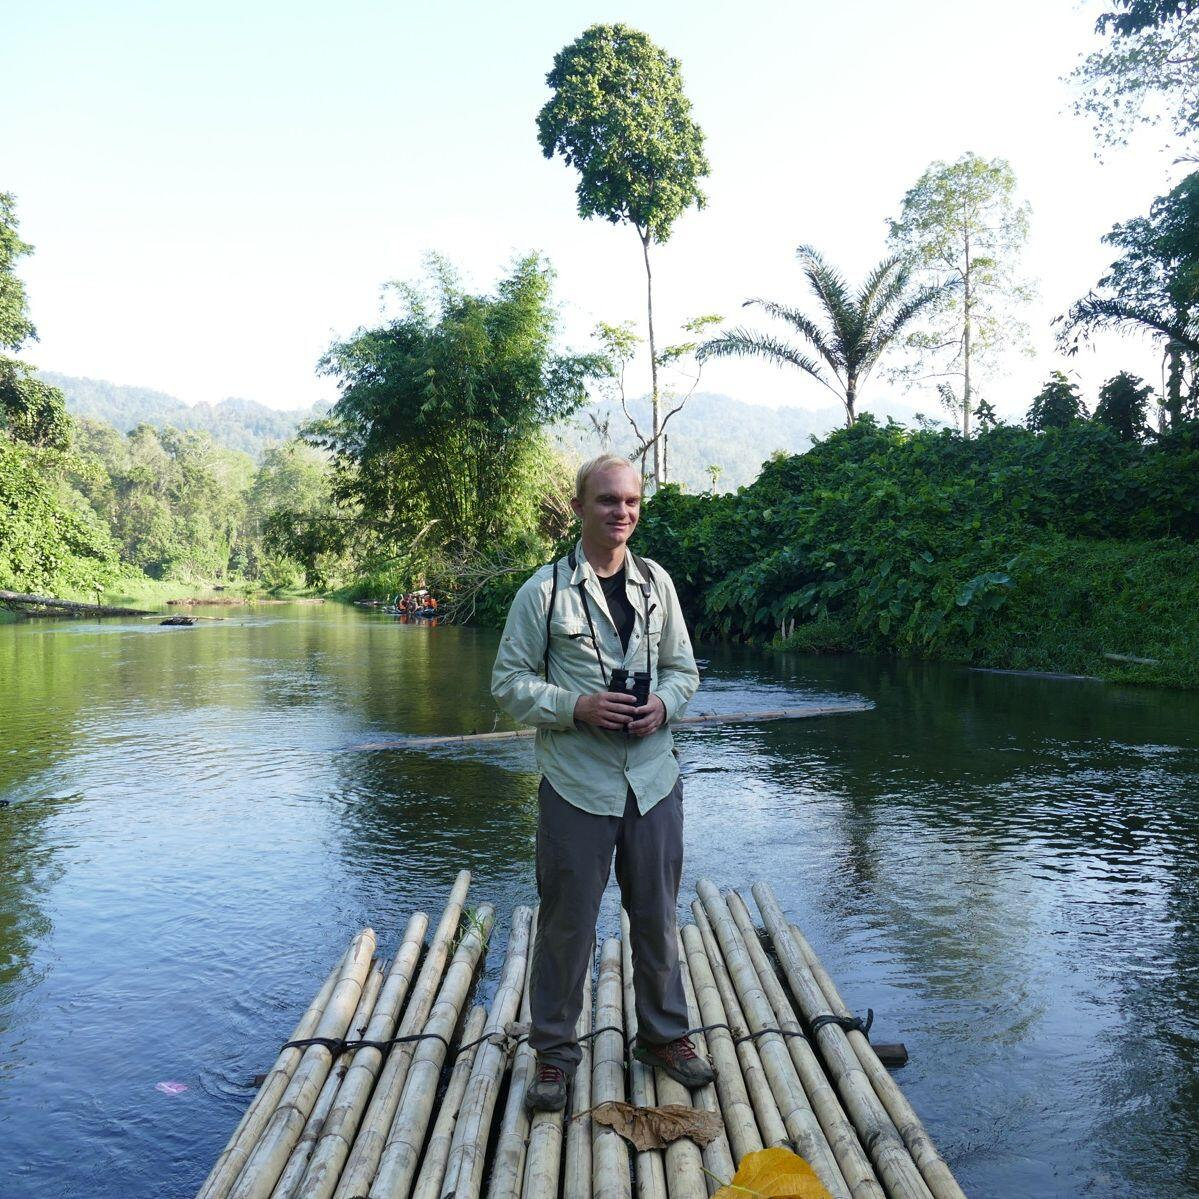 Noah balances on a bamboo raft to reach the forest. Noah Strycker